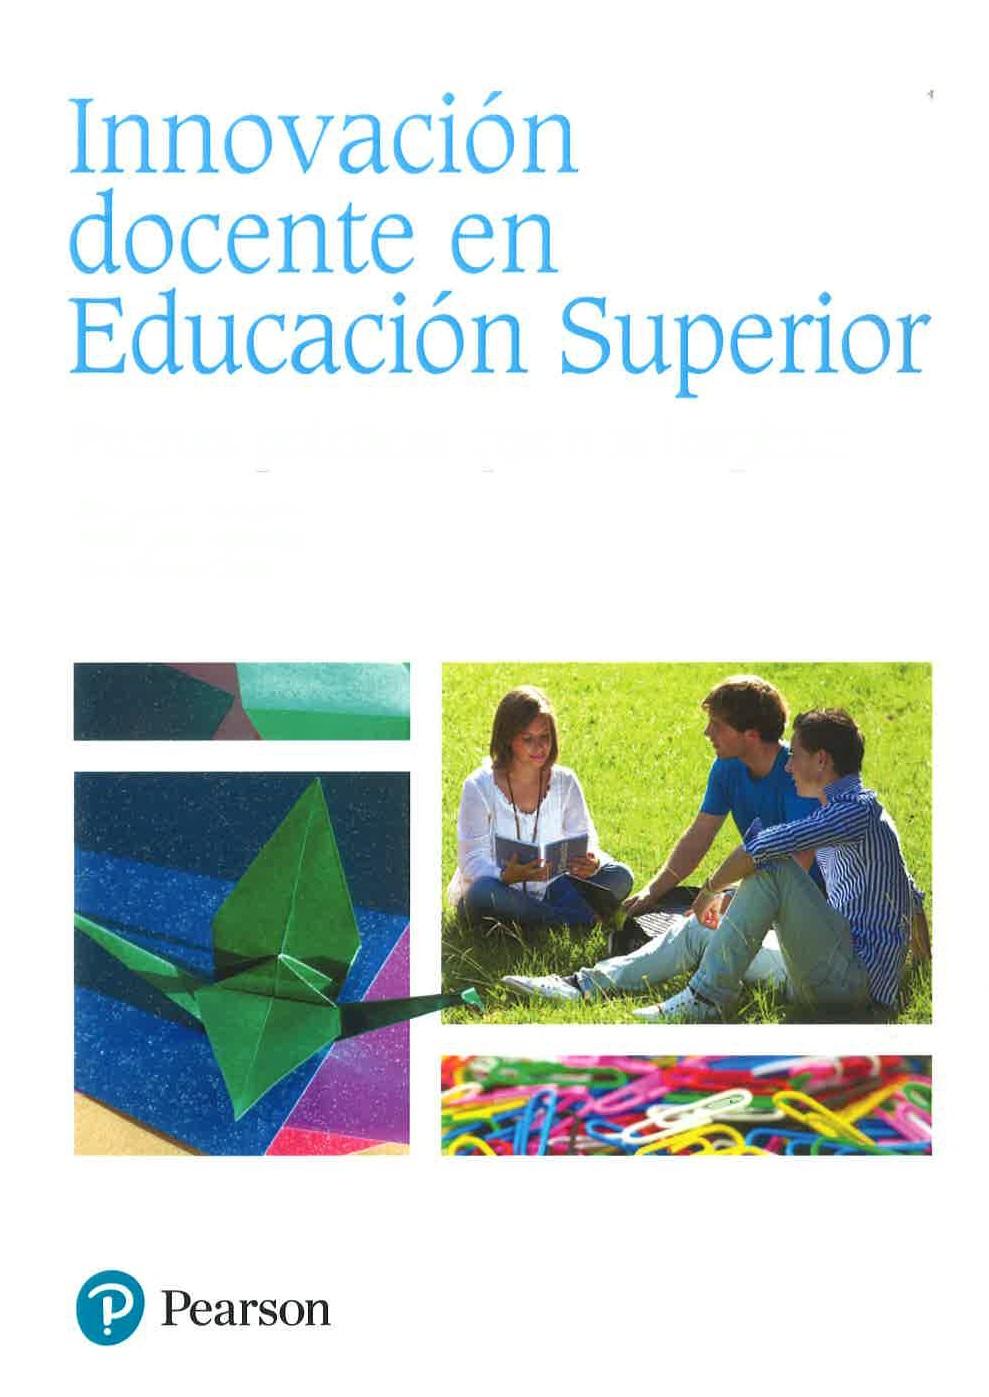 Innovación docente en educación superior